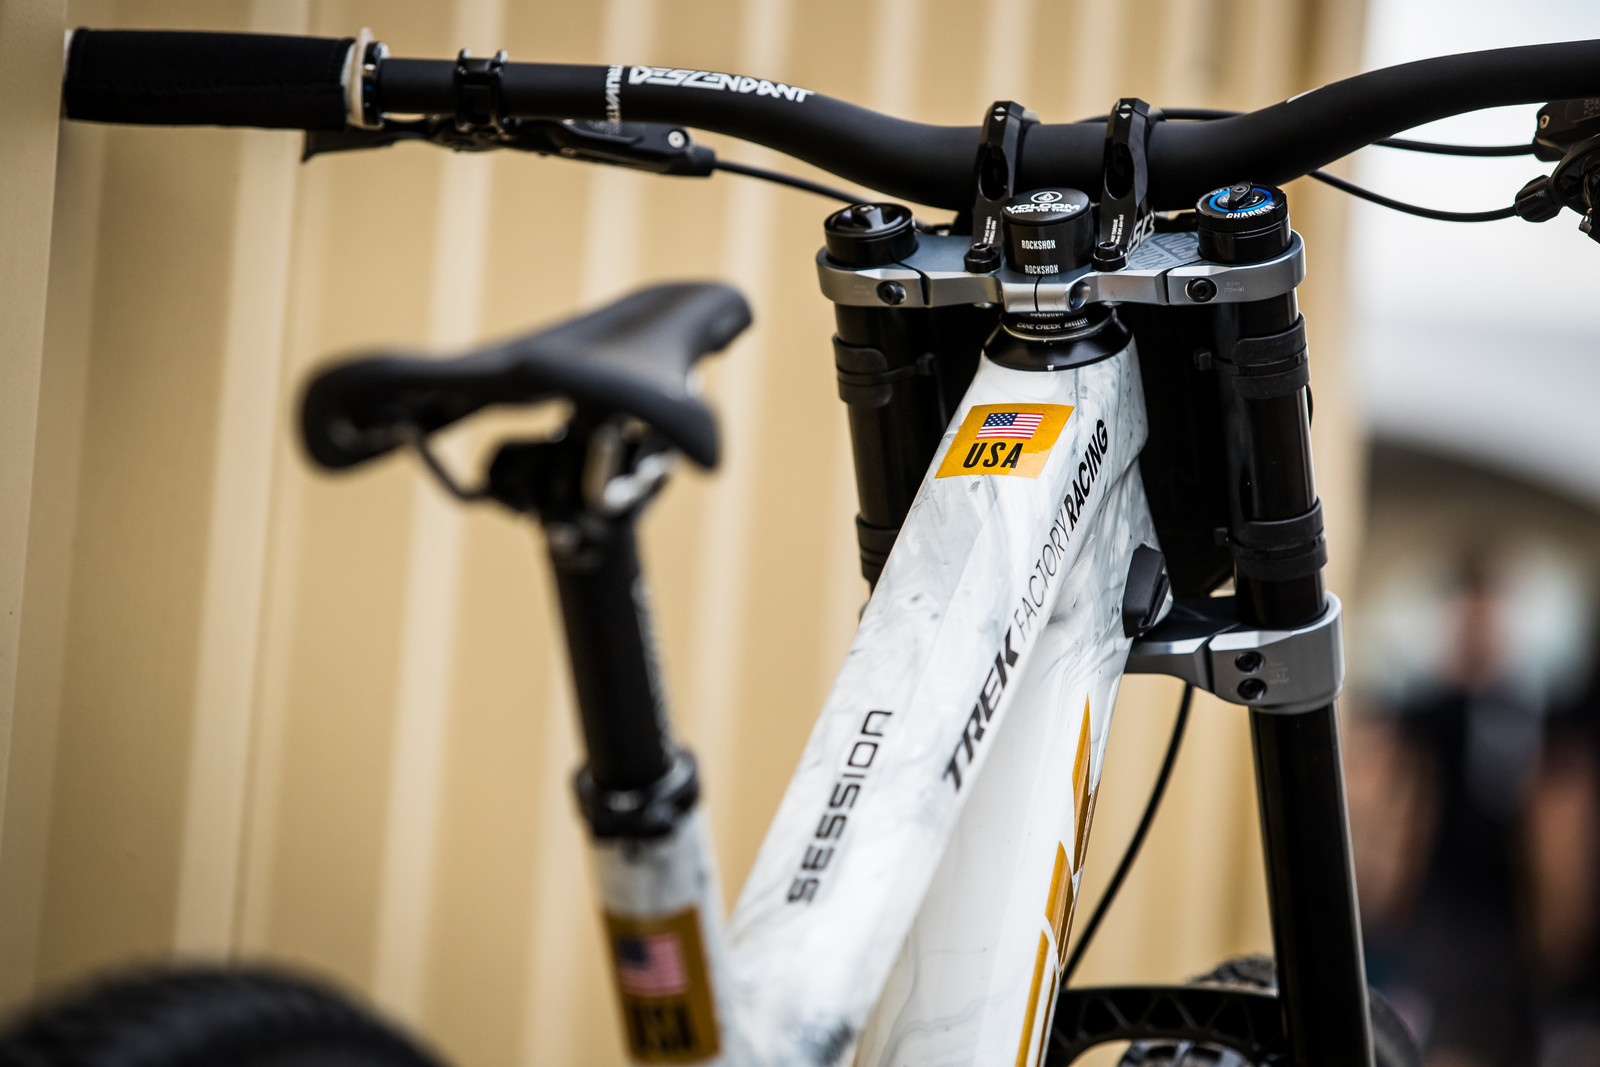 #USDH - Charlie Harrison's Trek Session World Champs Race Bike - Mountain Biking Pictures - Vital MTB